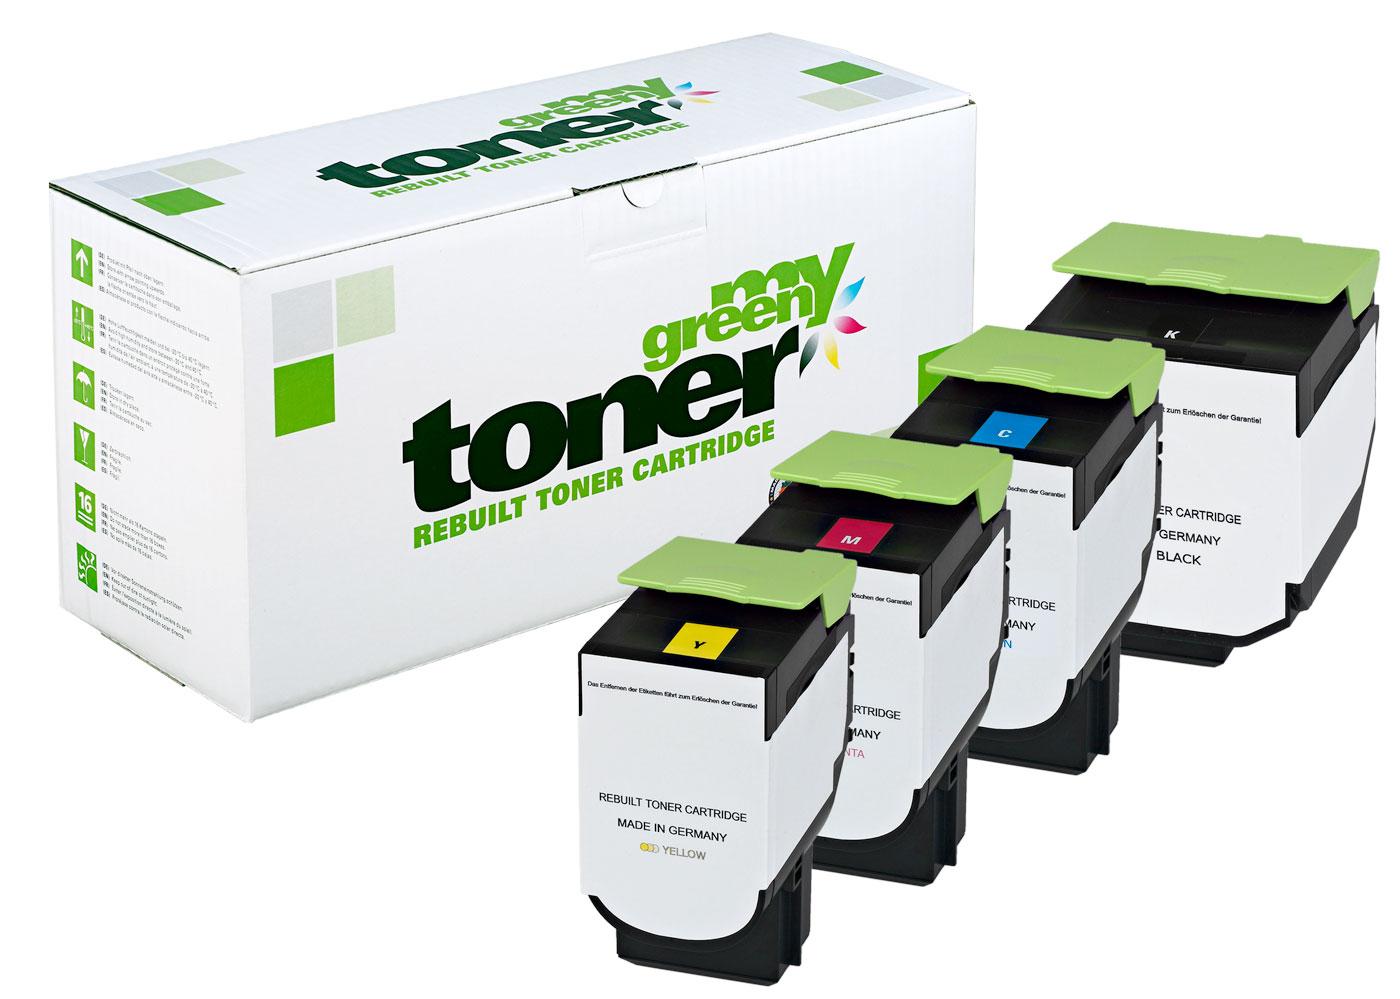 Rebuilt toner cartridge for Lexmark CS 421, CX 421/522